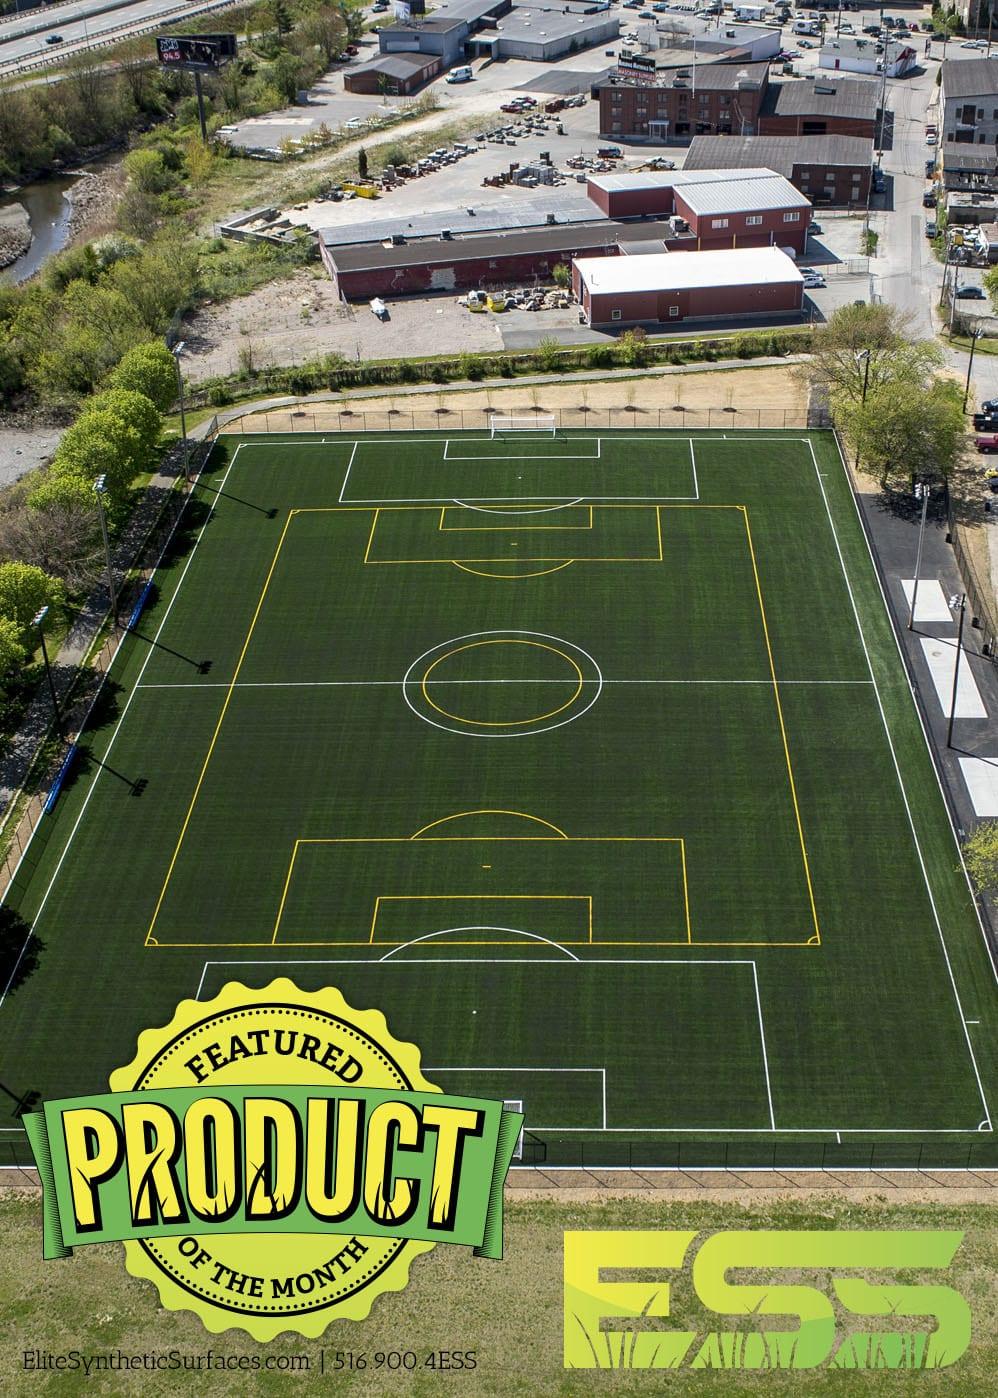 Britland Park Soccer Field - Fall River MA